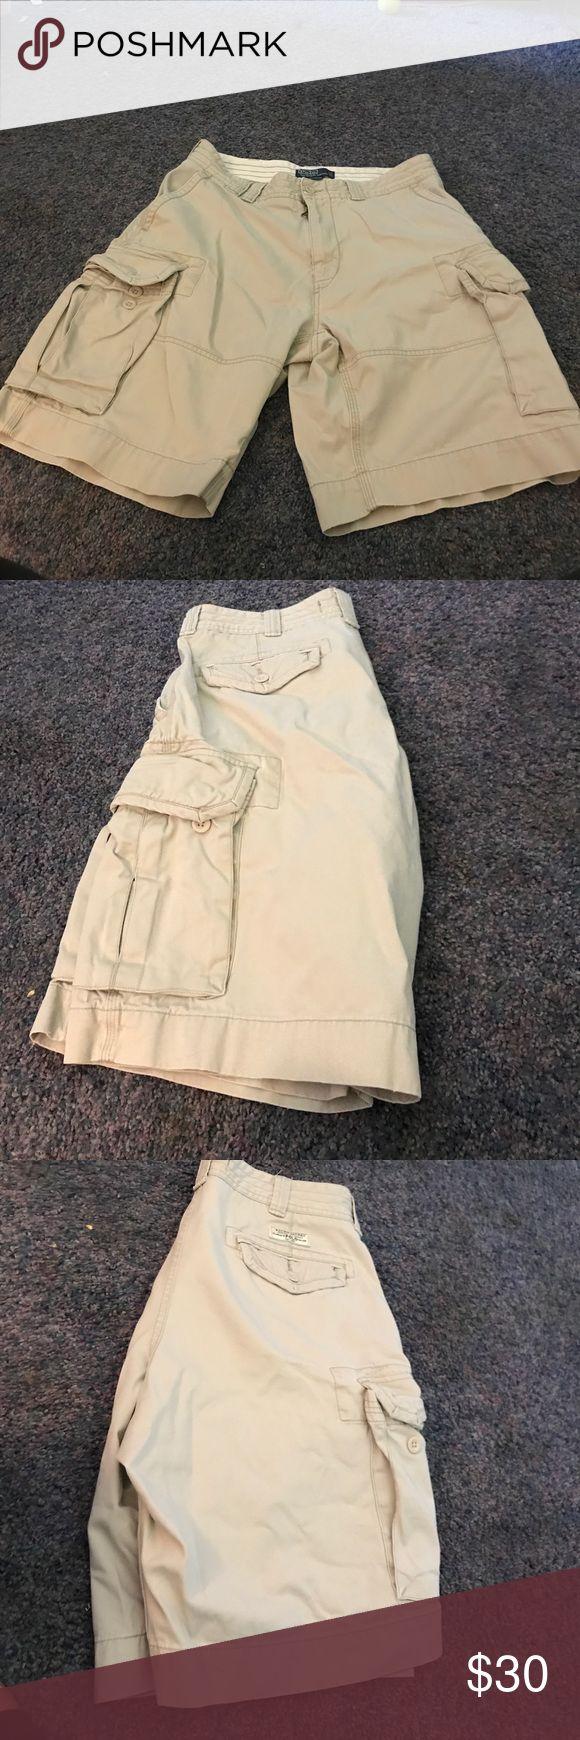 Light khaki cargo short size 34 polo Ralph Lauren Men's Light khaki polo Ralph Lauren cargo shorts size 34 Polo by Ralph Lauren Shorts Cargo